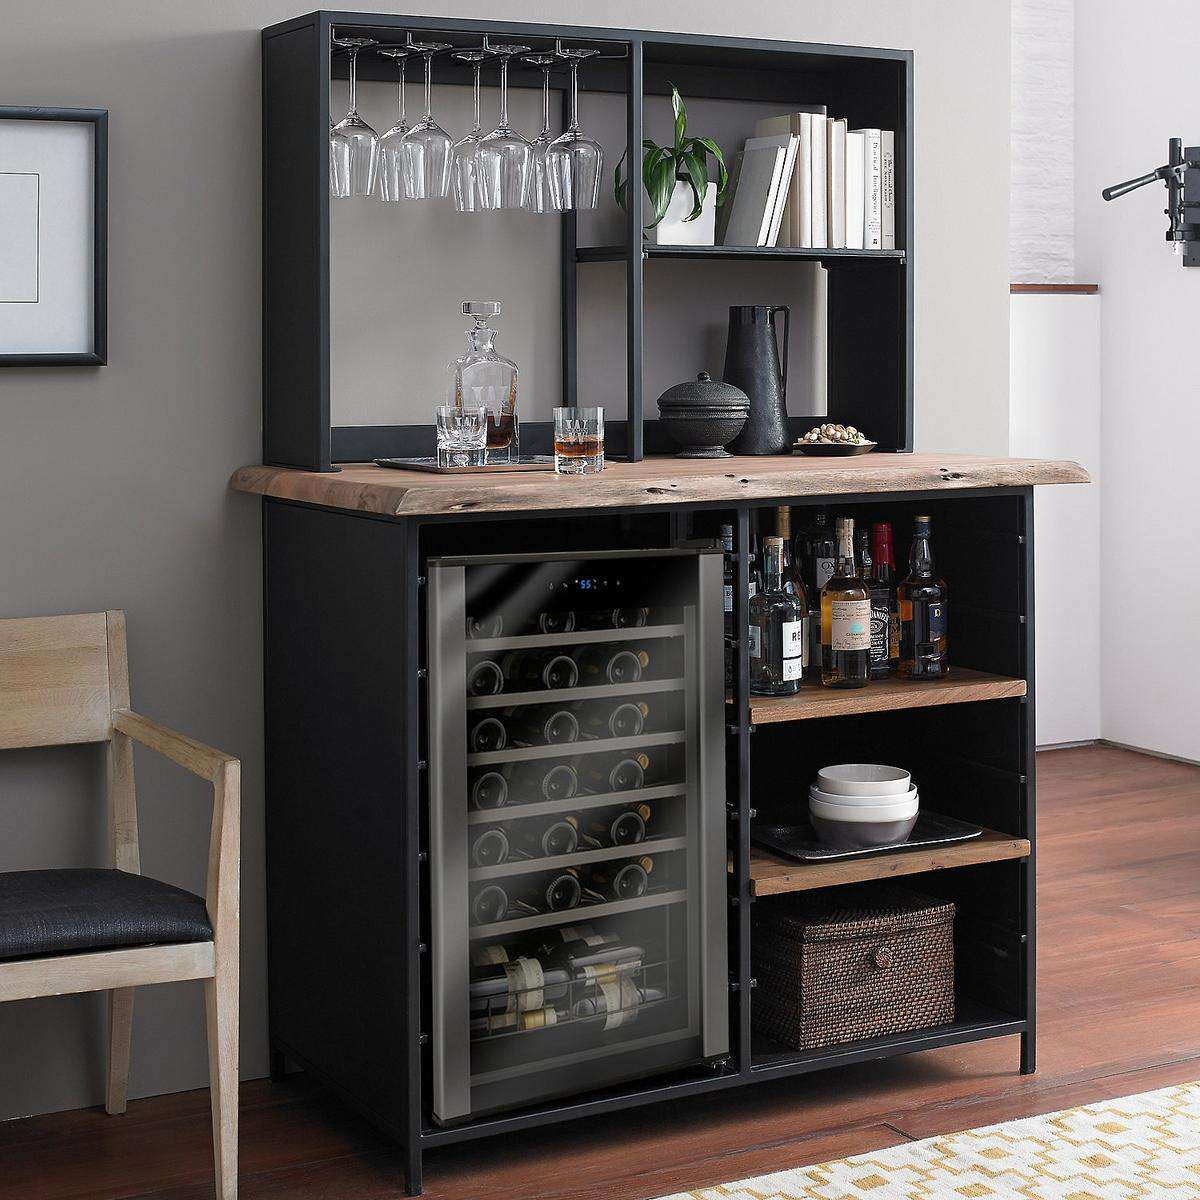 Morgon Live Edge Metal and Wood Wine Bar with Wine Refrigerator